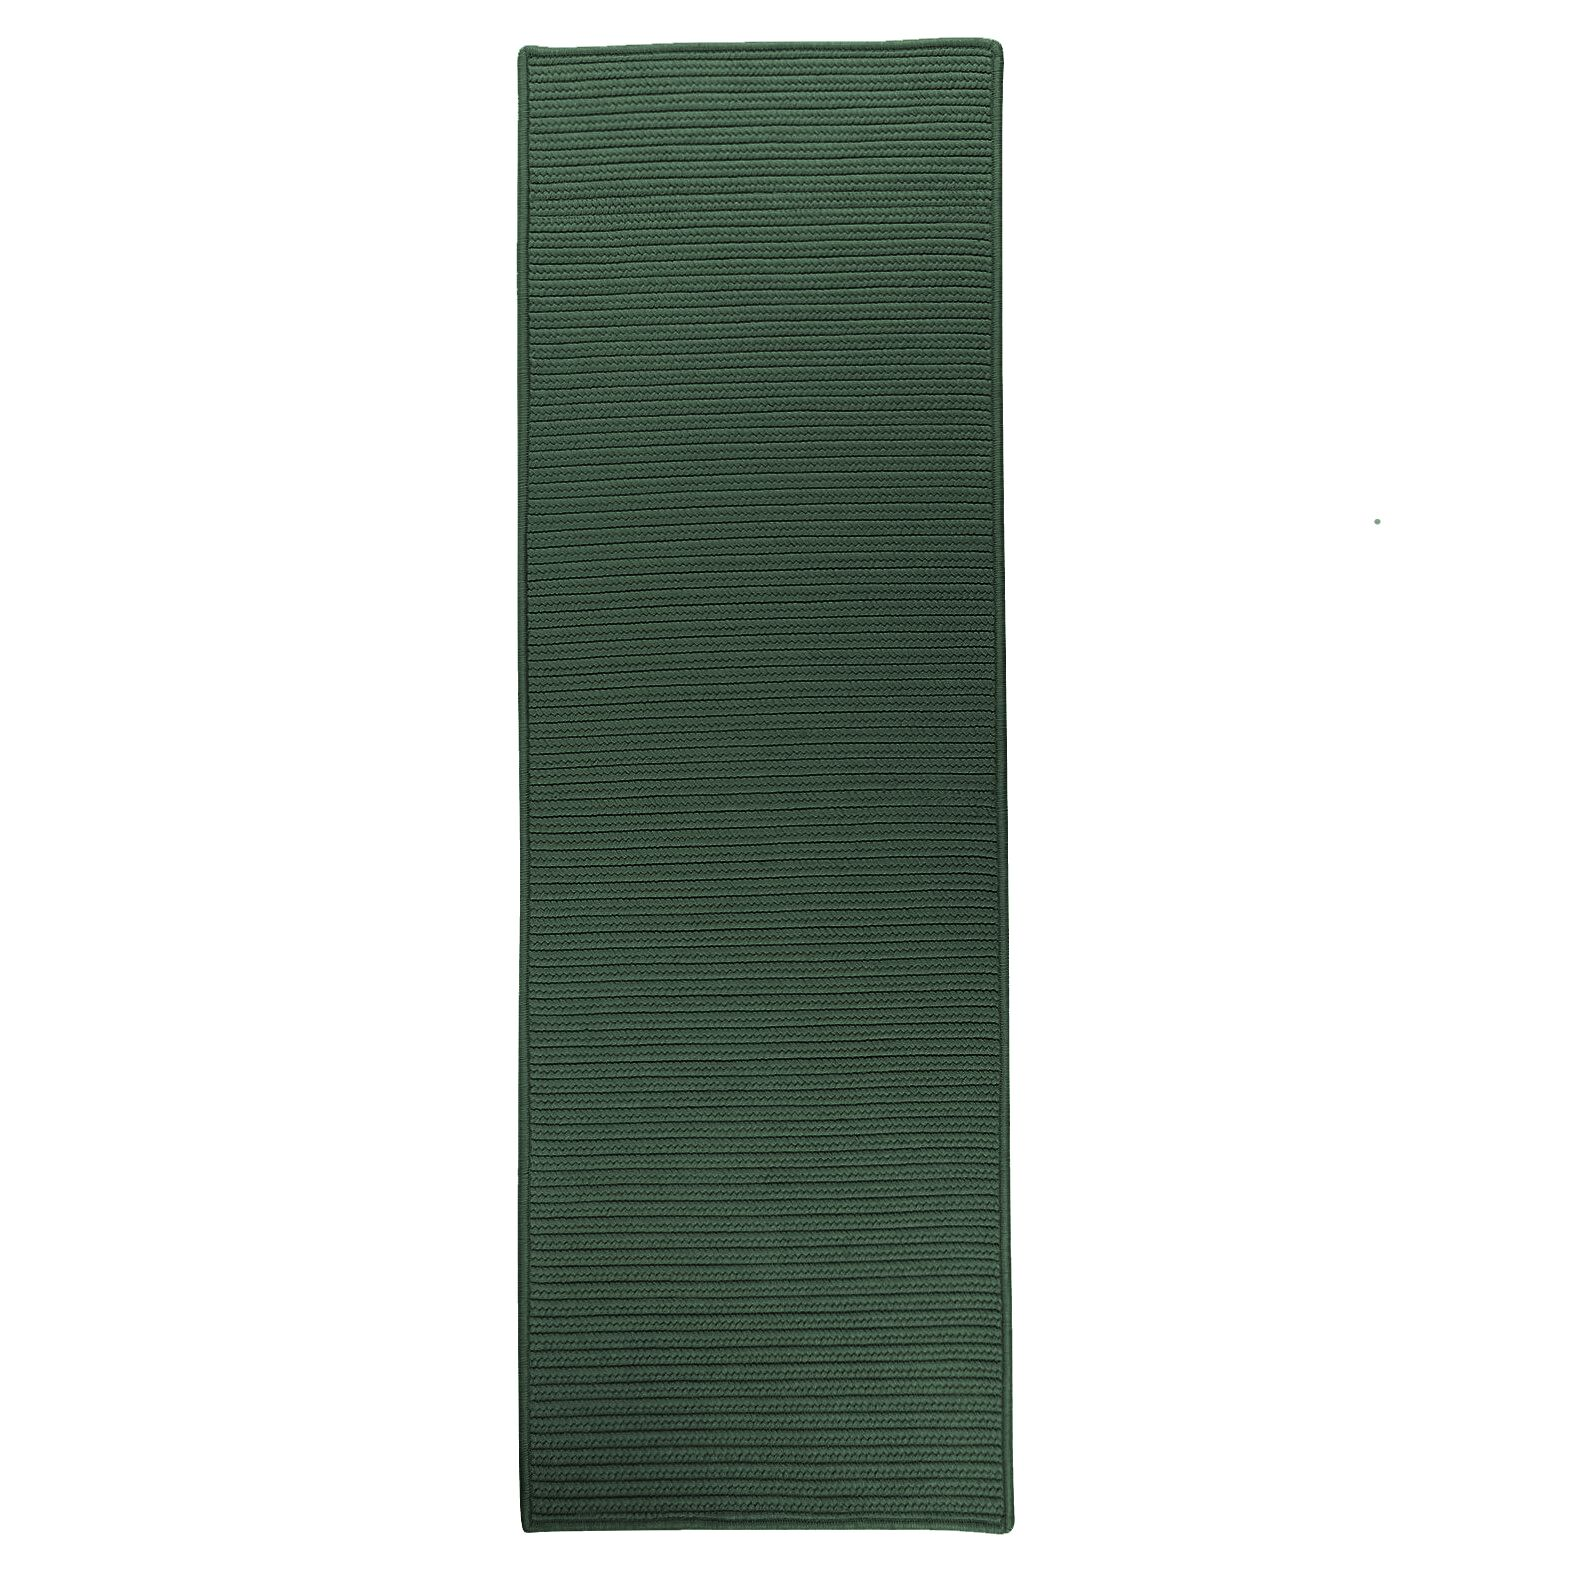 Annika Reversible Hand-Braided Green Indoor/Outdoor Area Rug Rug Size: Runner 2'4